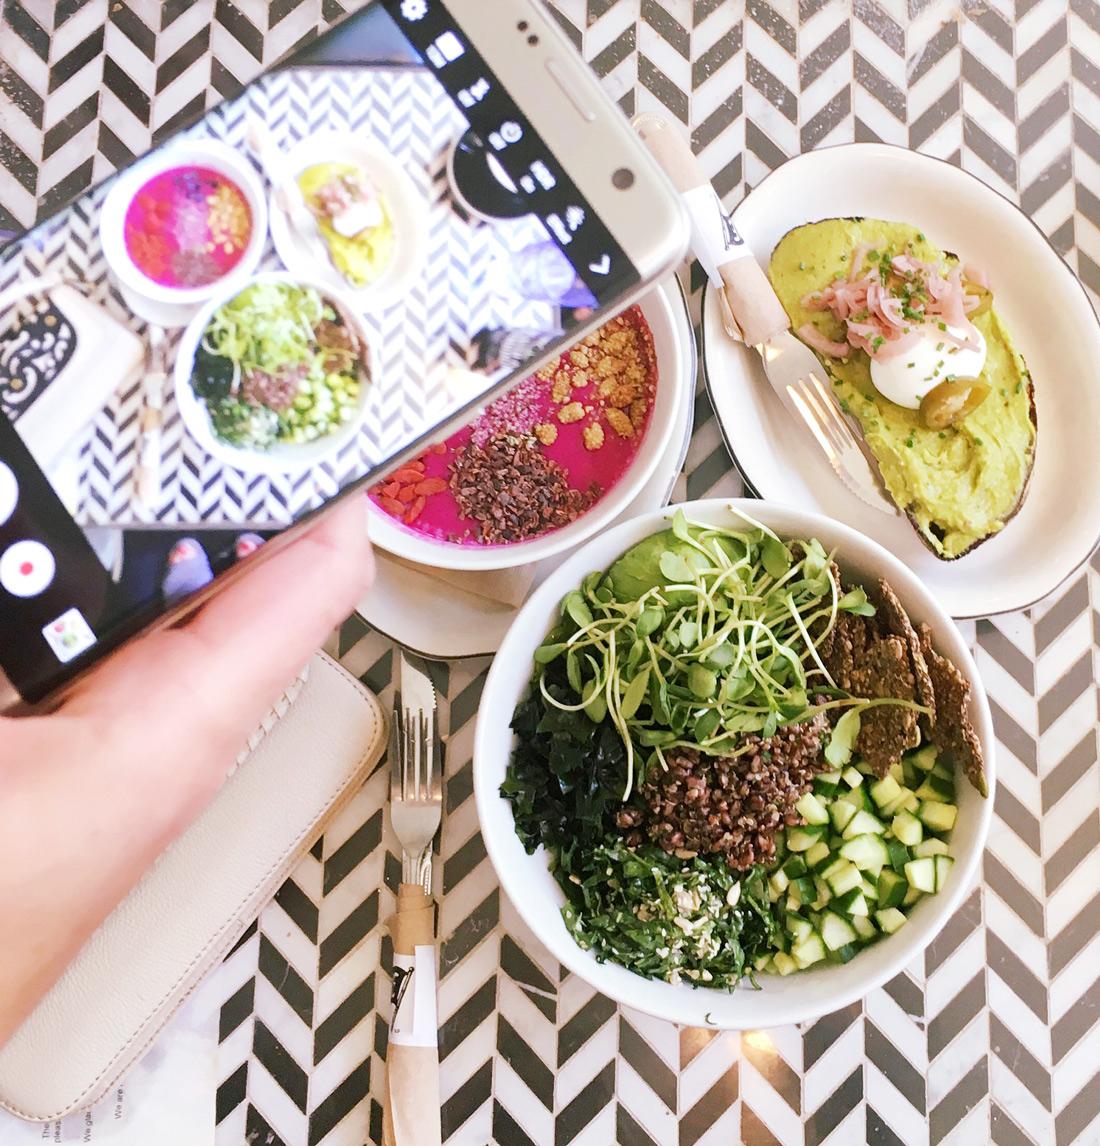 Bag-at-you---Travel-blog---Great-food-california